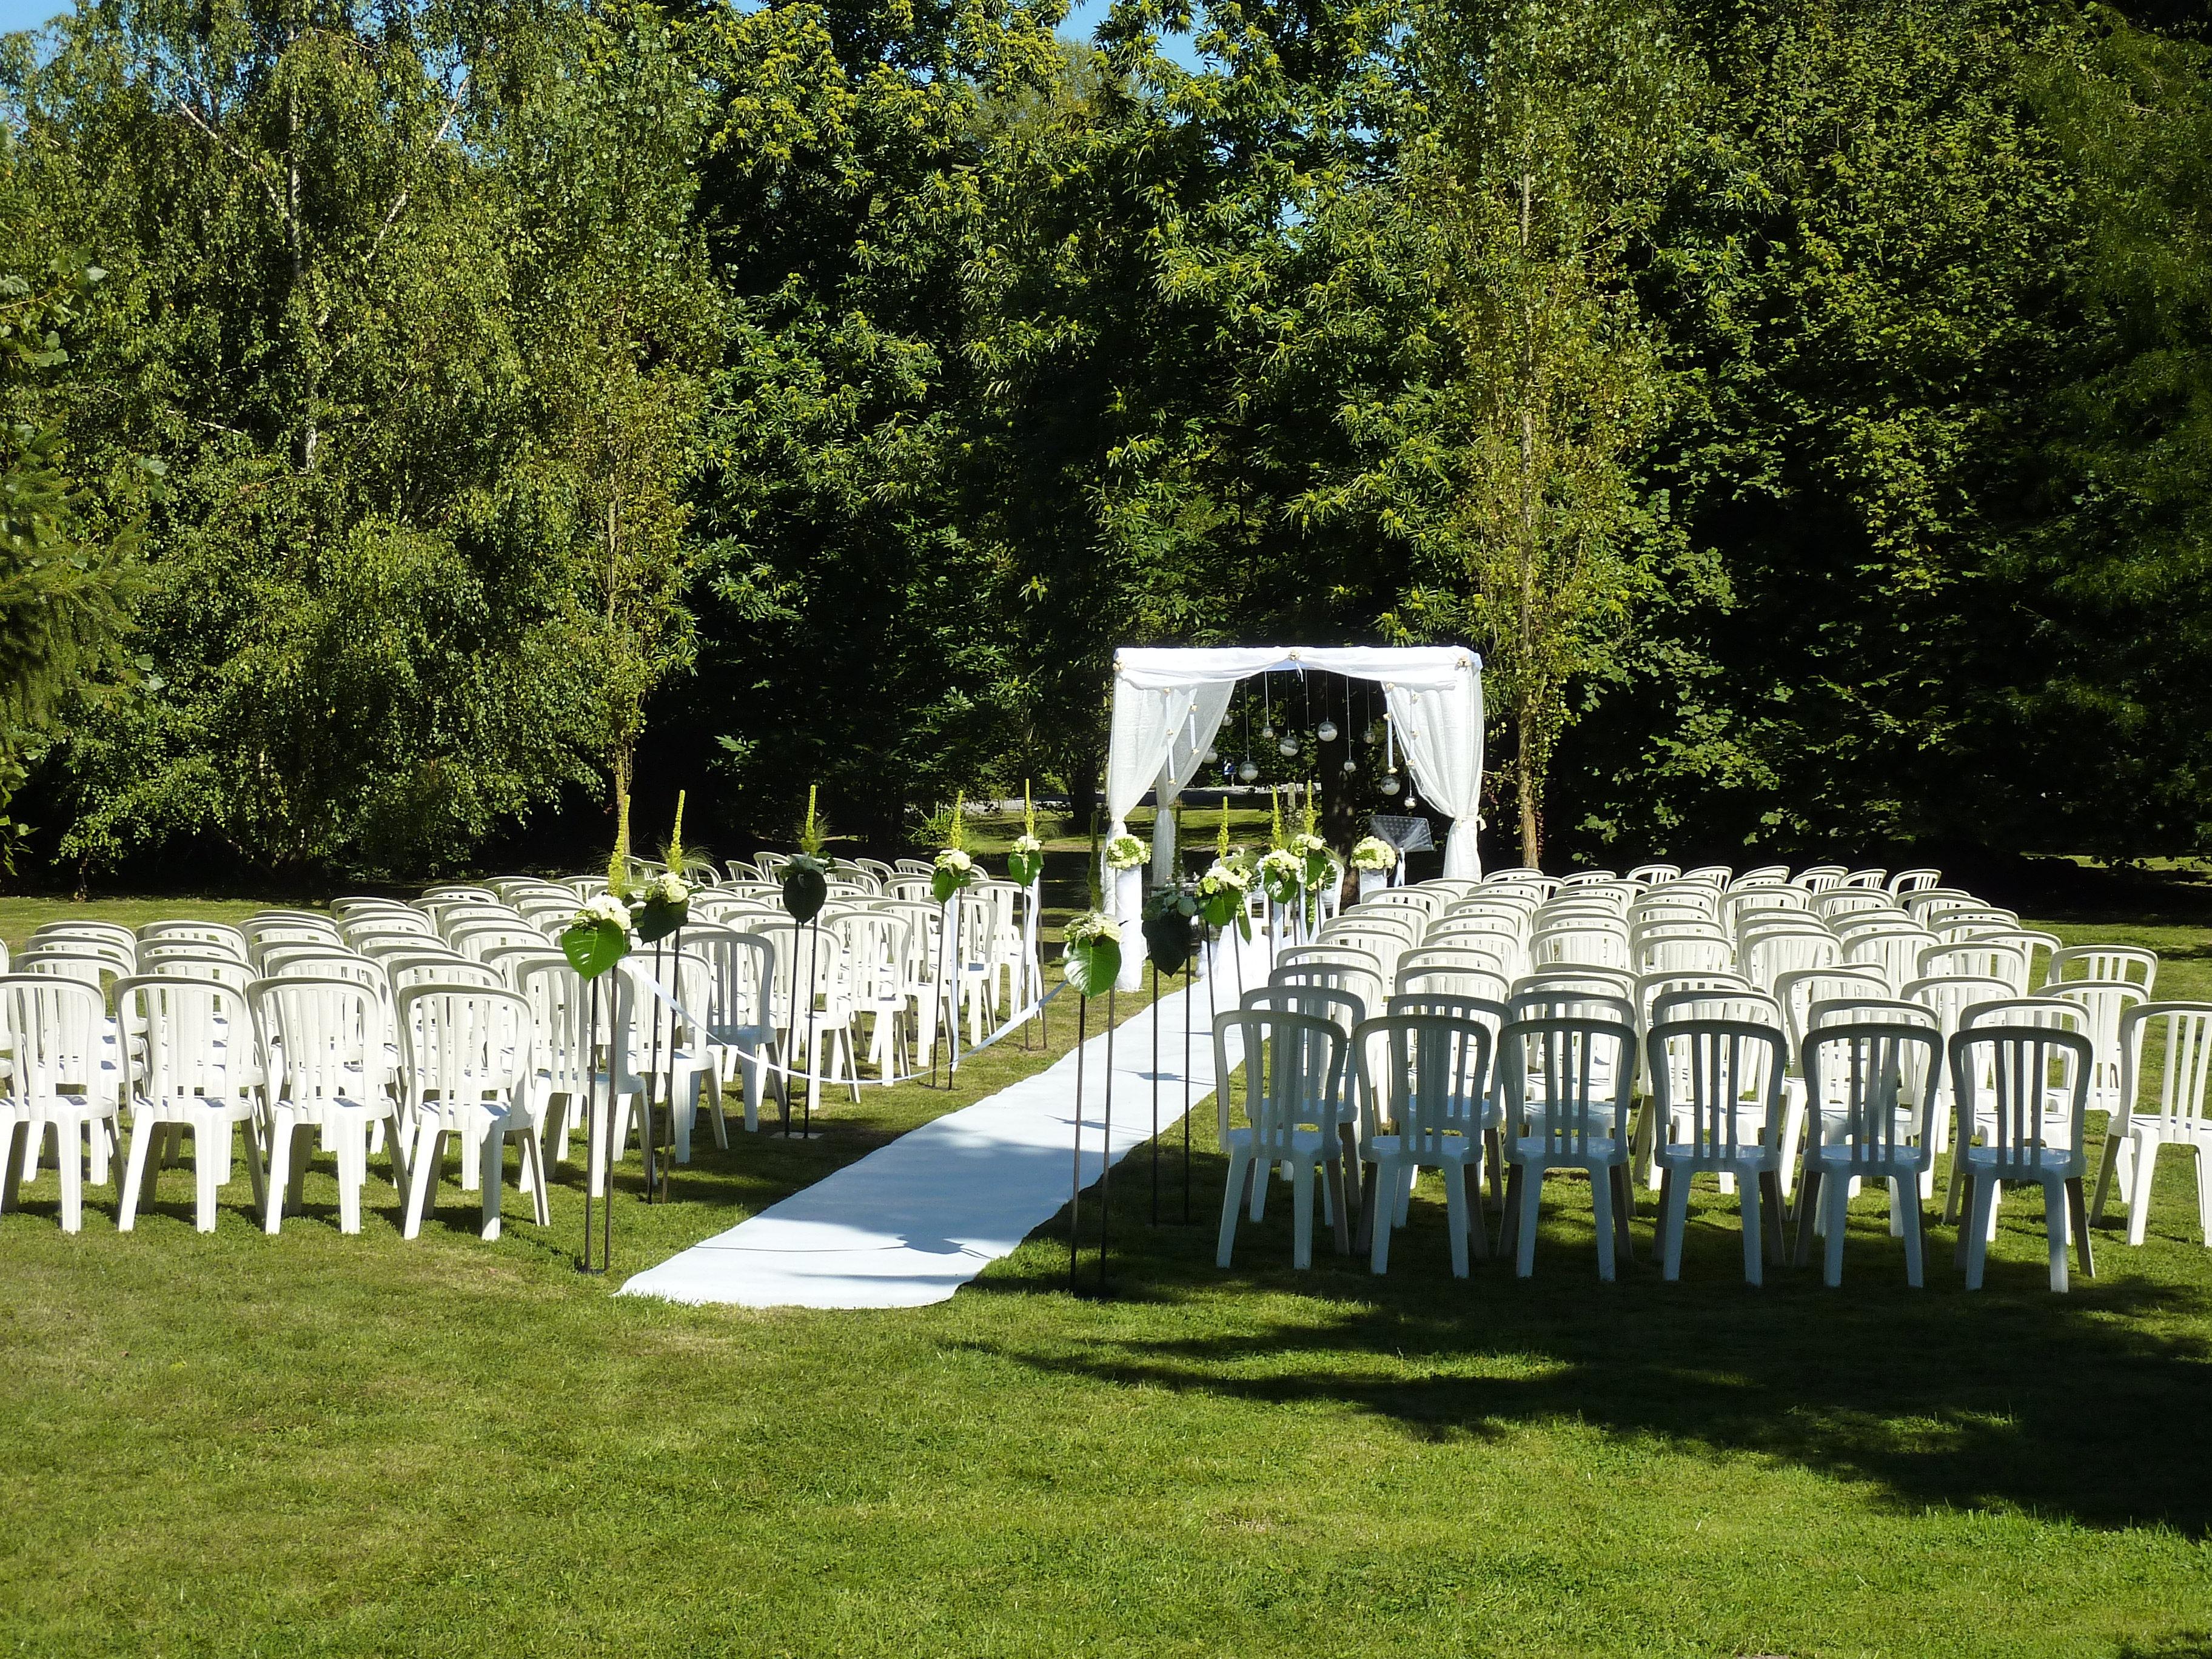 noces de cana wedding planner organisateur de mariage mariage ext rieur wedding planner. Black Bedroom Furniture Sets. Home Design Ideas